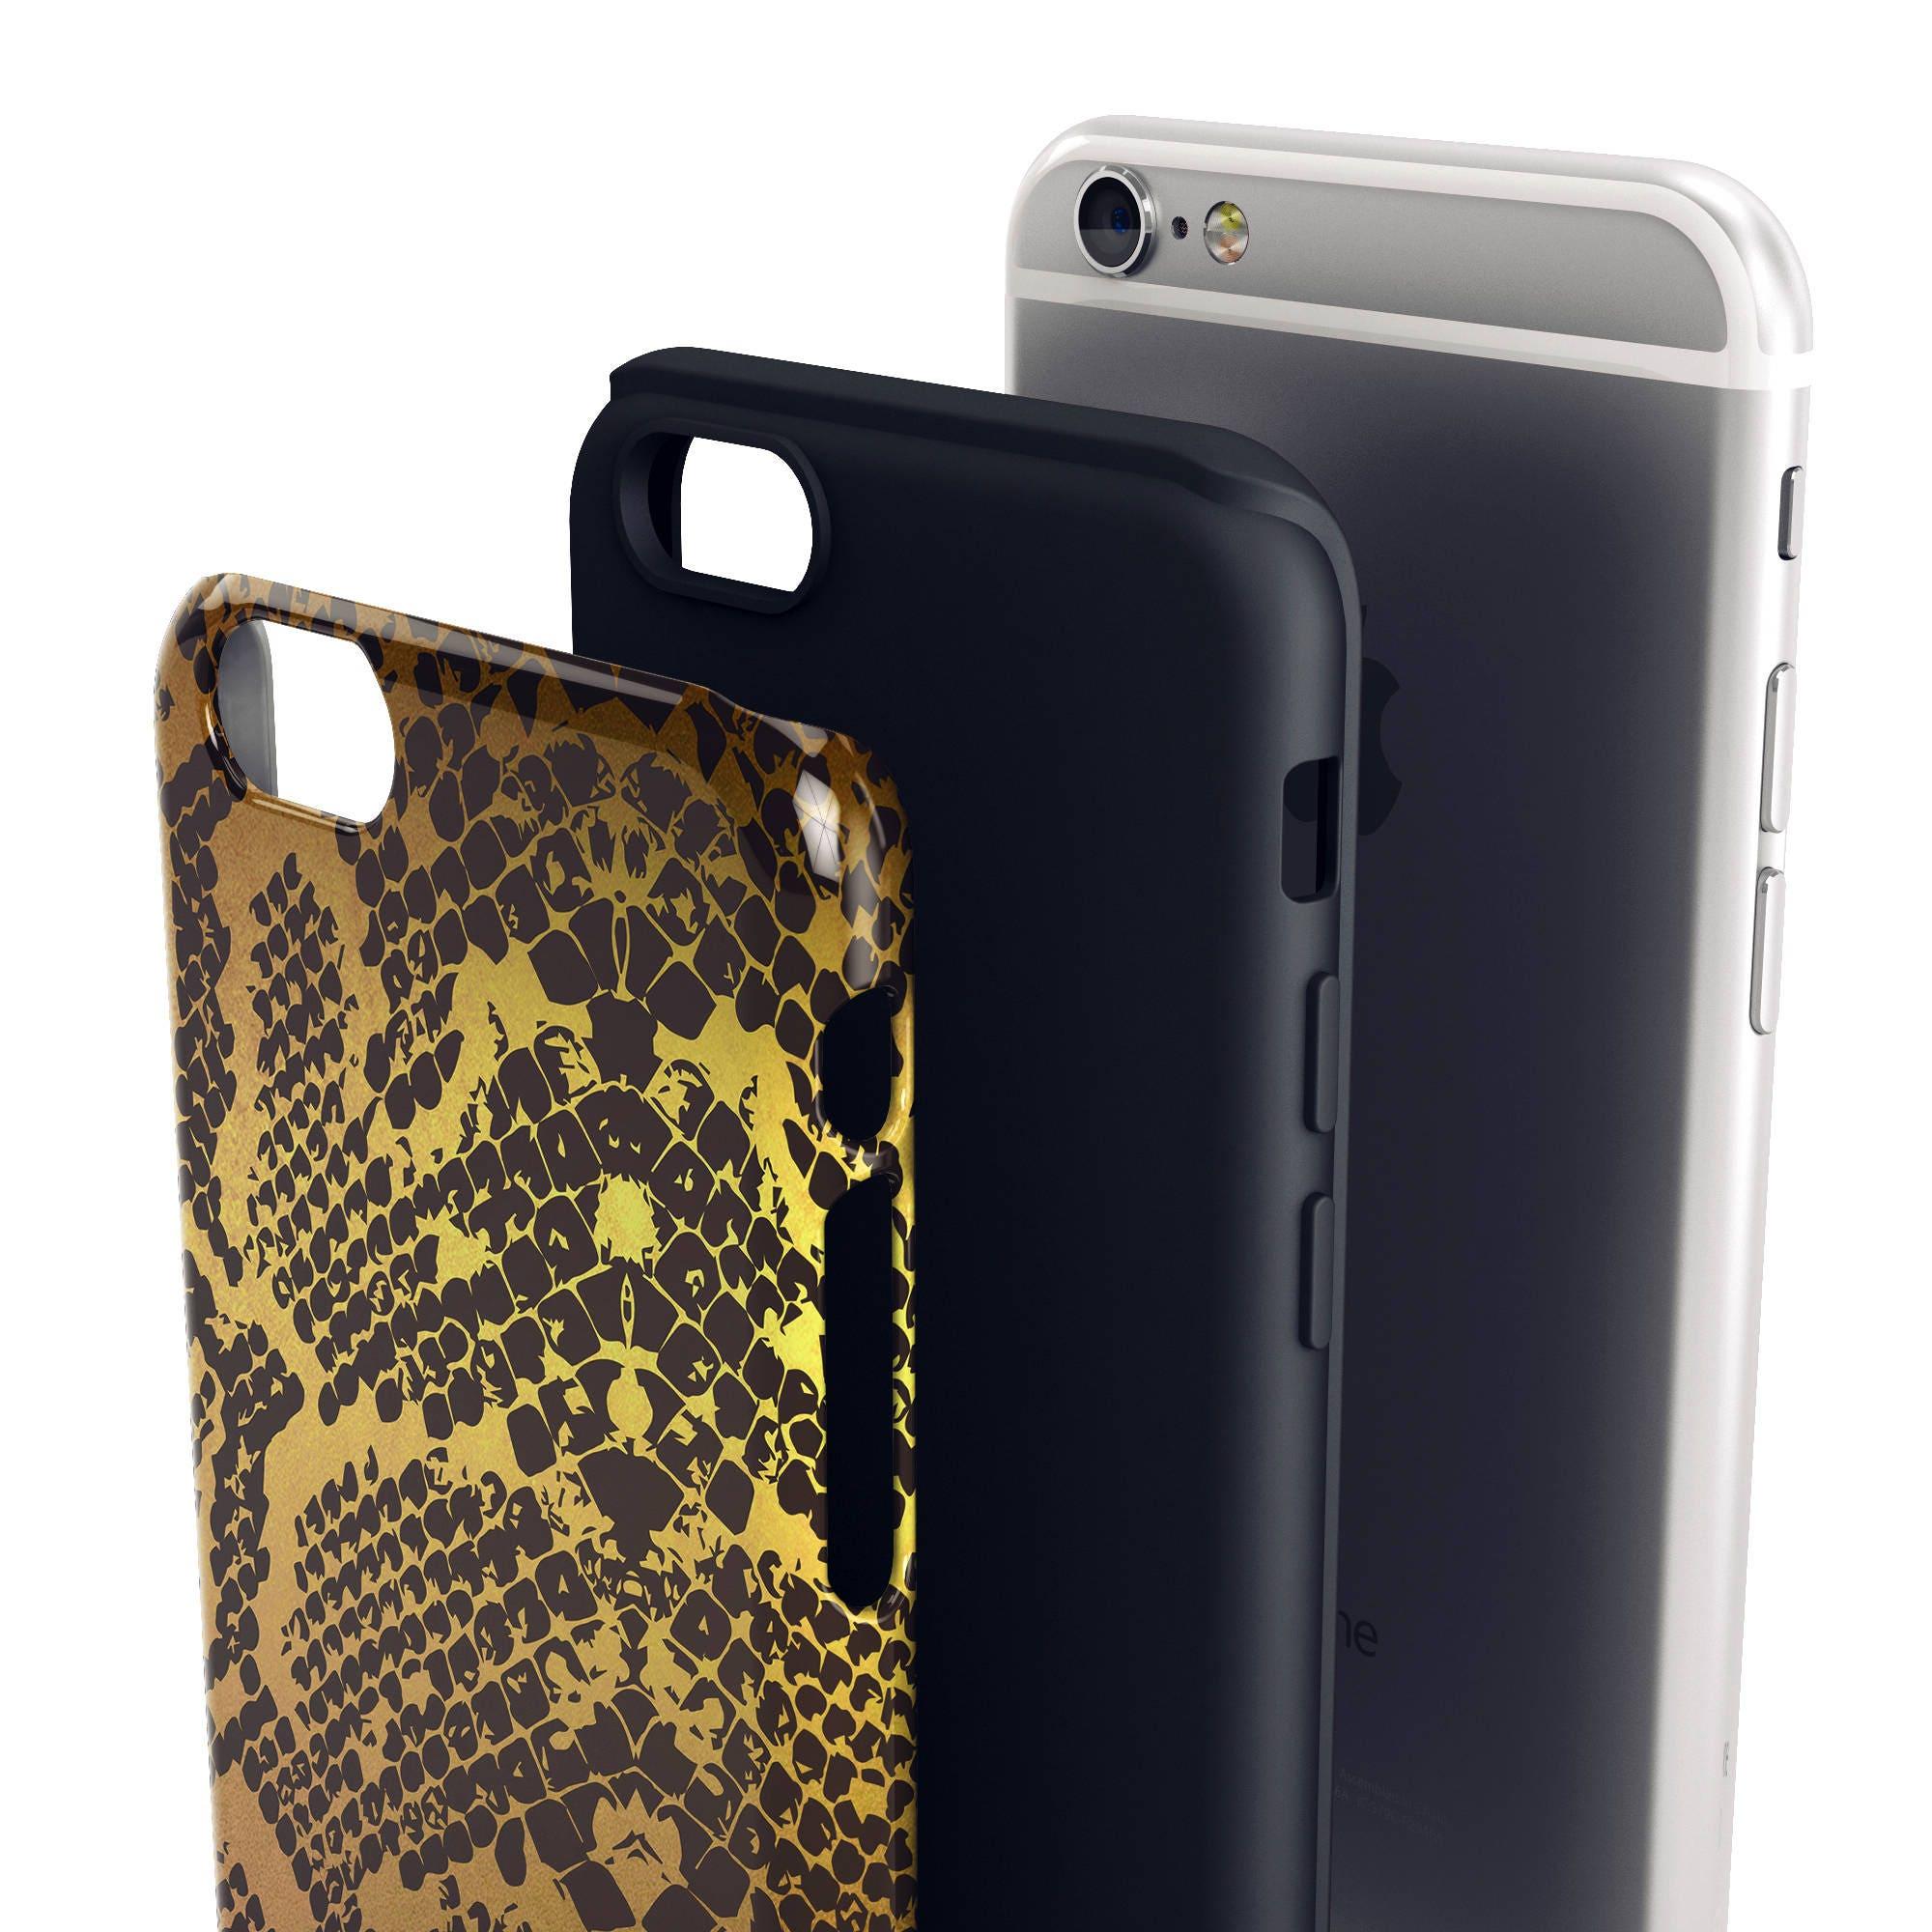 Gold Animal Print, Snake, Anatomy Fun Cool Unique Apple 5 5S 6 6S 8 ...